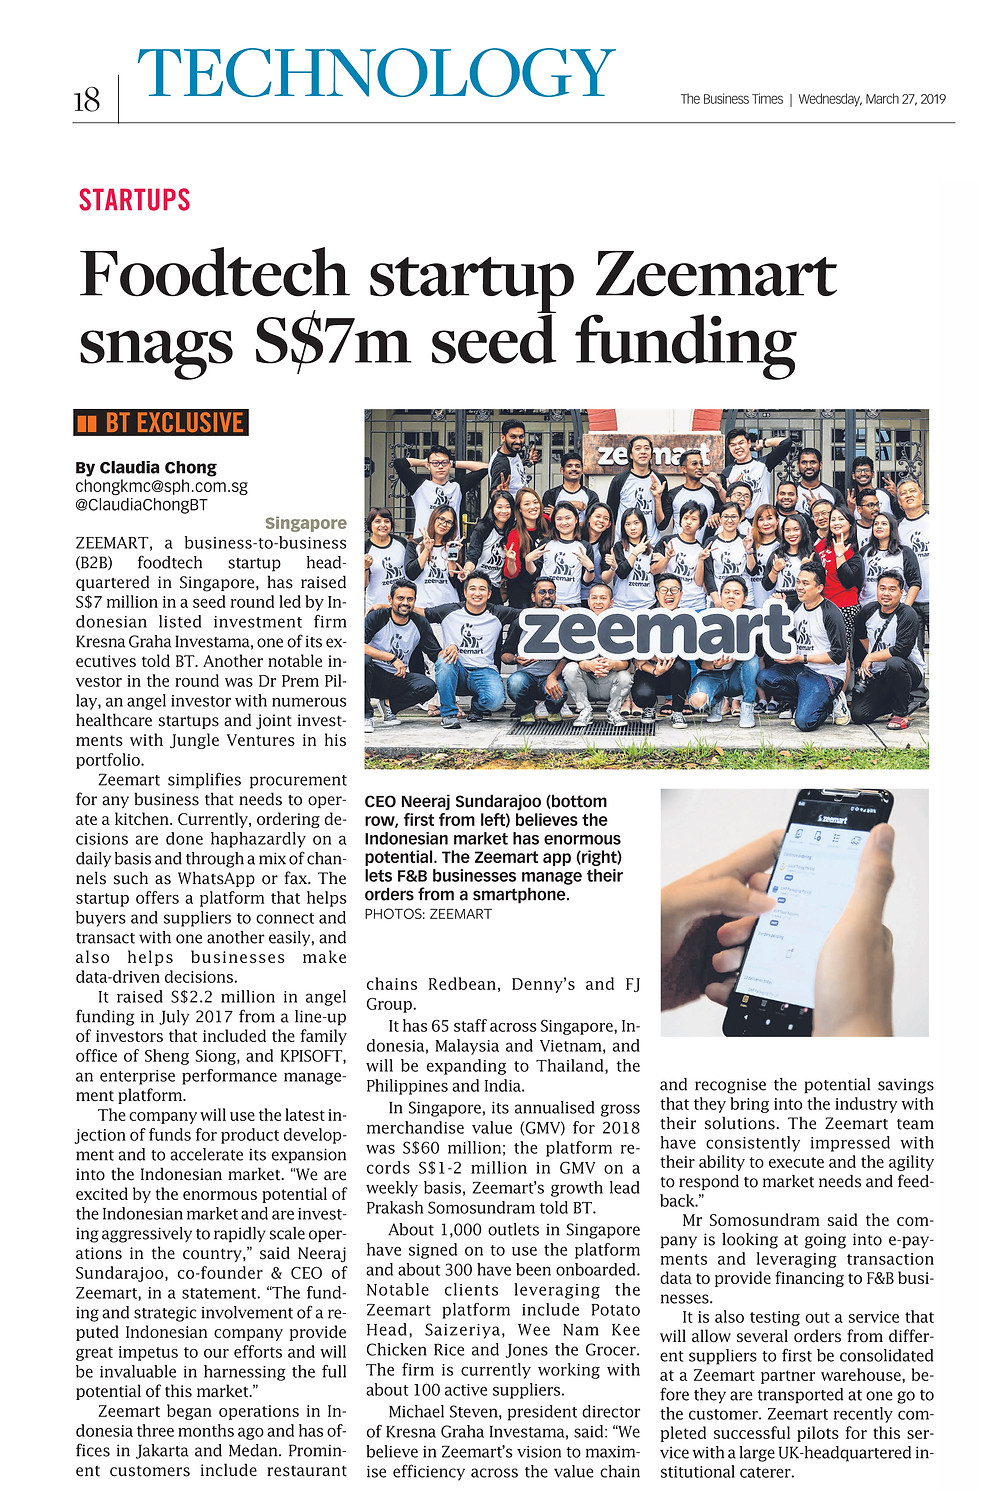 Foodtech startup Zeemart snags S$7m seed funding